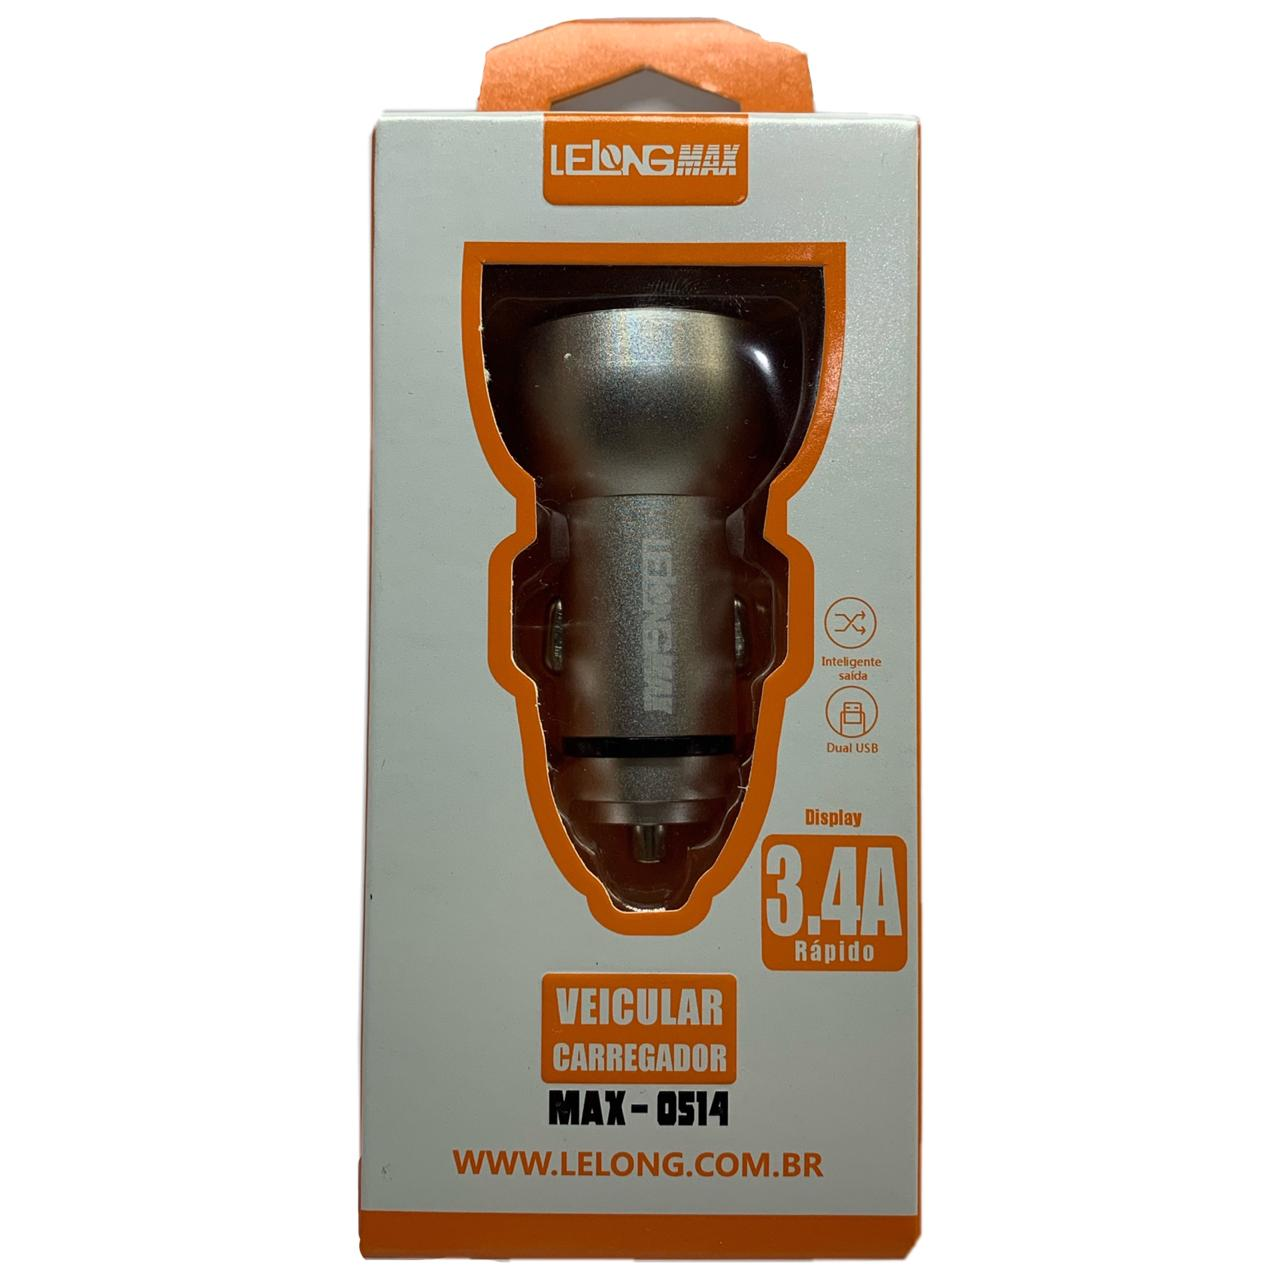 Carregador Veicular Lelong max 3.4a 2 portas USB